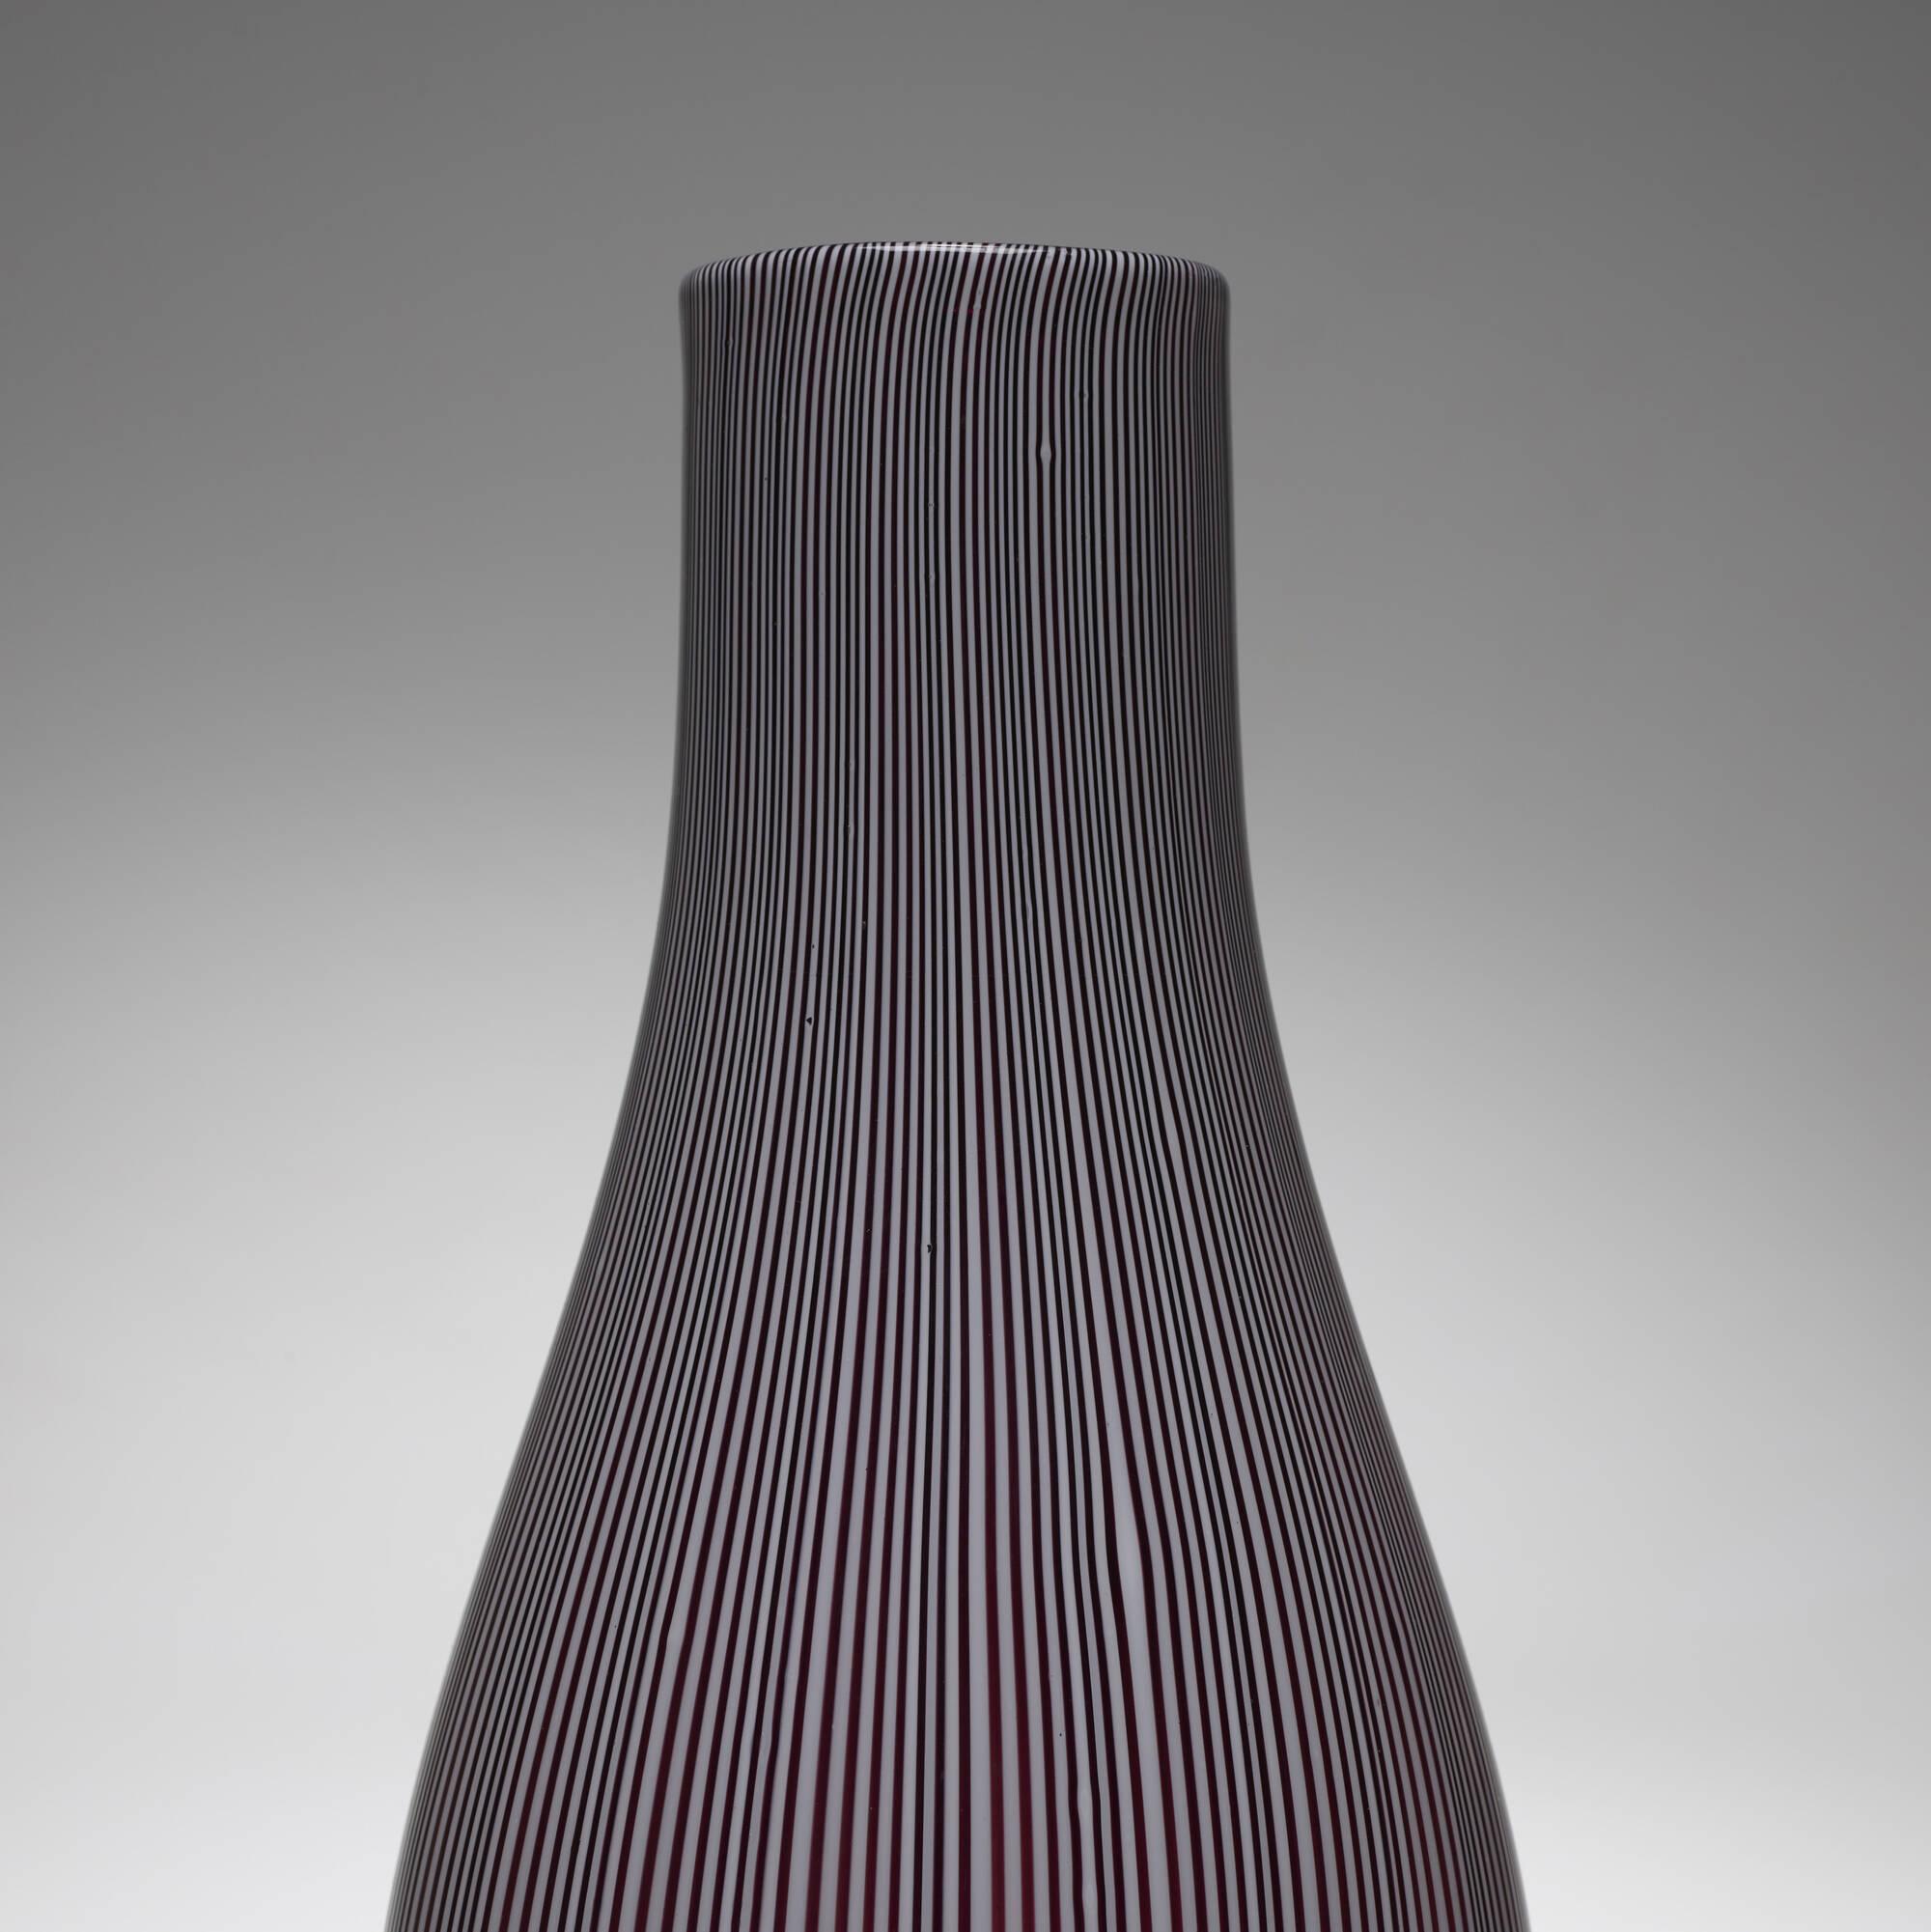 131: Carlo Scarpa / Tessuto vase, 3547 (3 of 4)